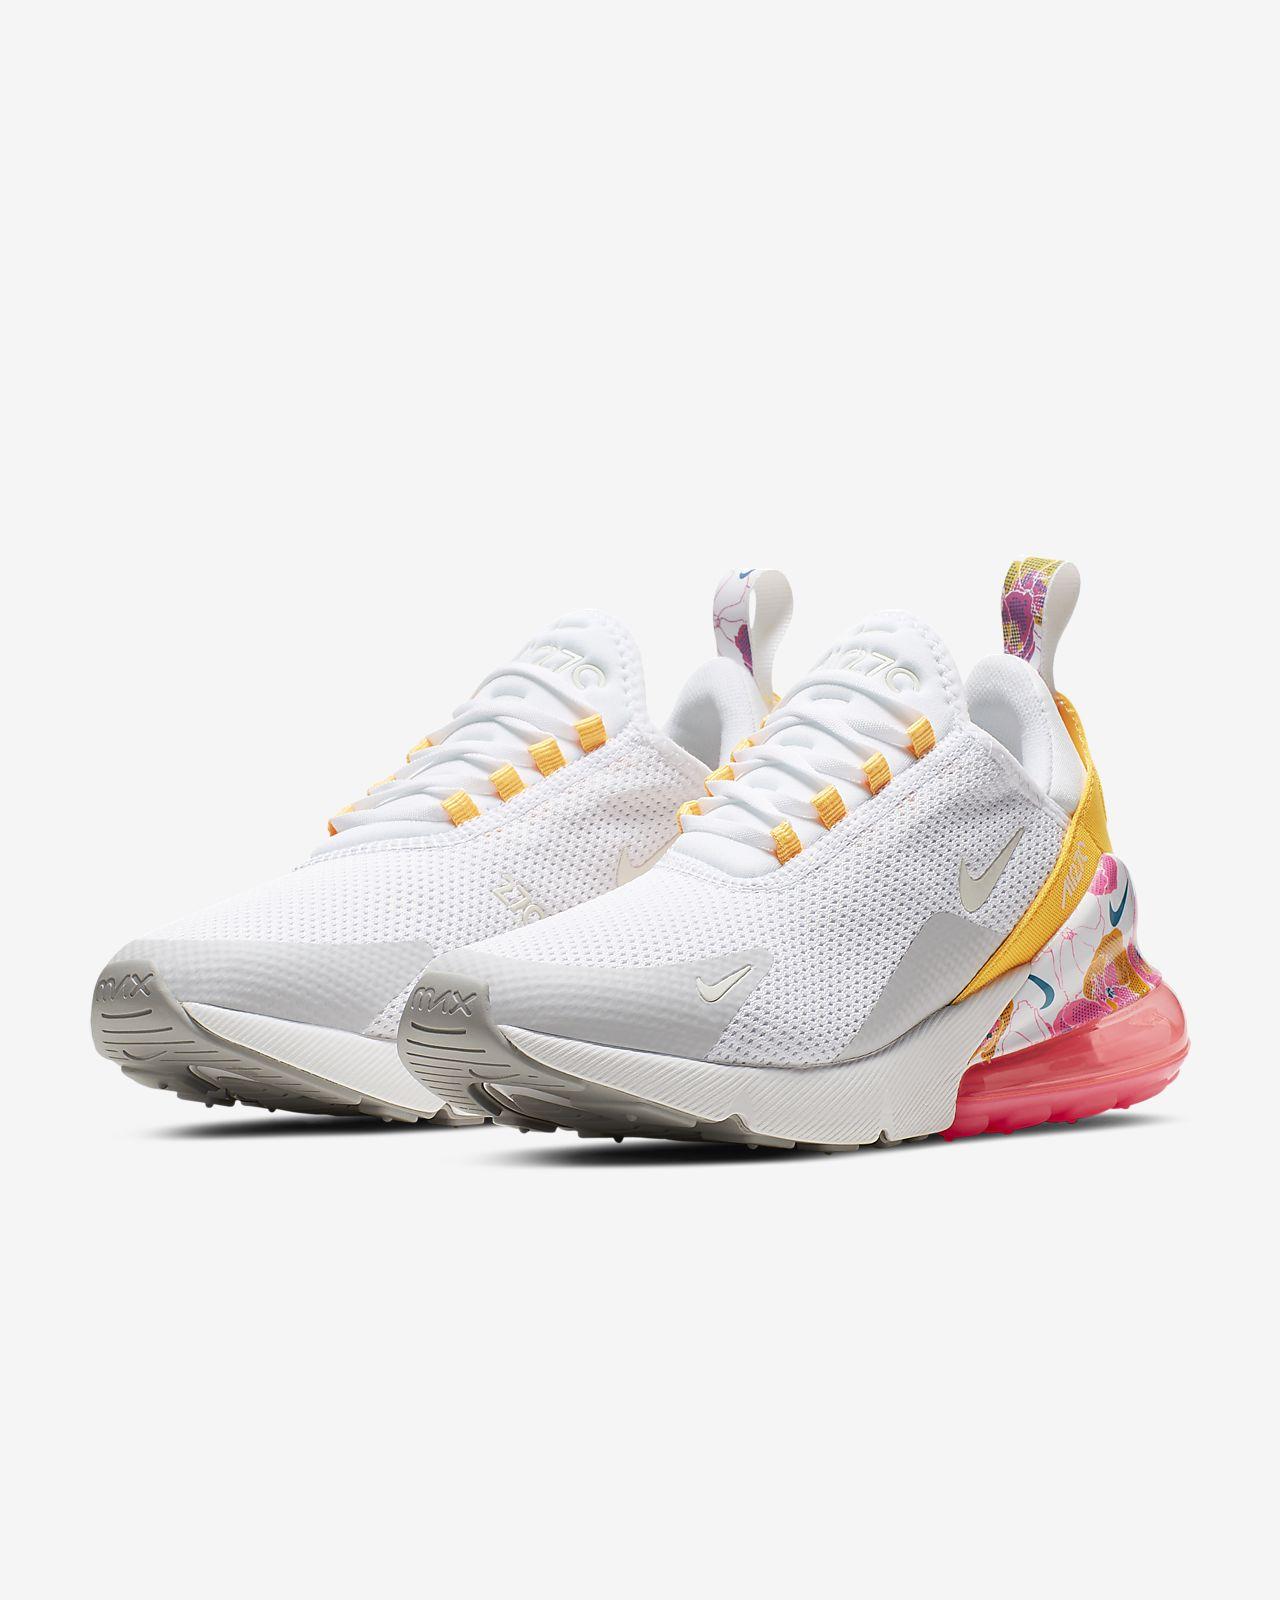 the latest cb57b 142b8 ... Nike Air Max 270 SE Floral Women s Shoe